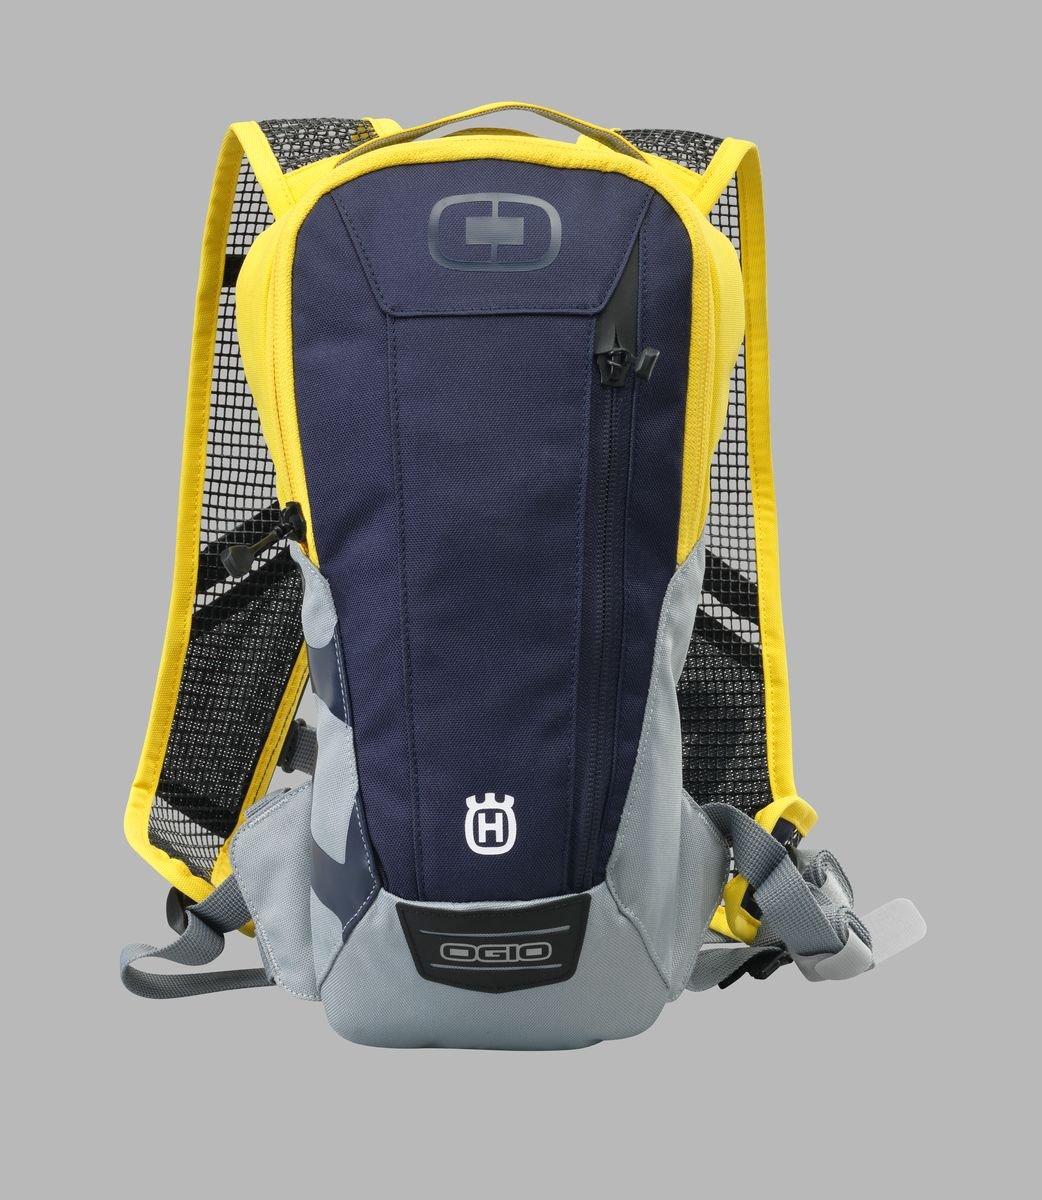 Husqvarna Erzberg Hydration Bag 3HS1870200 Ogio 4333027246